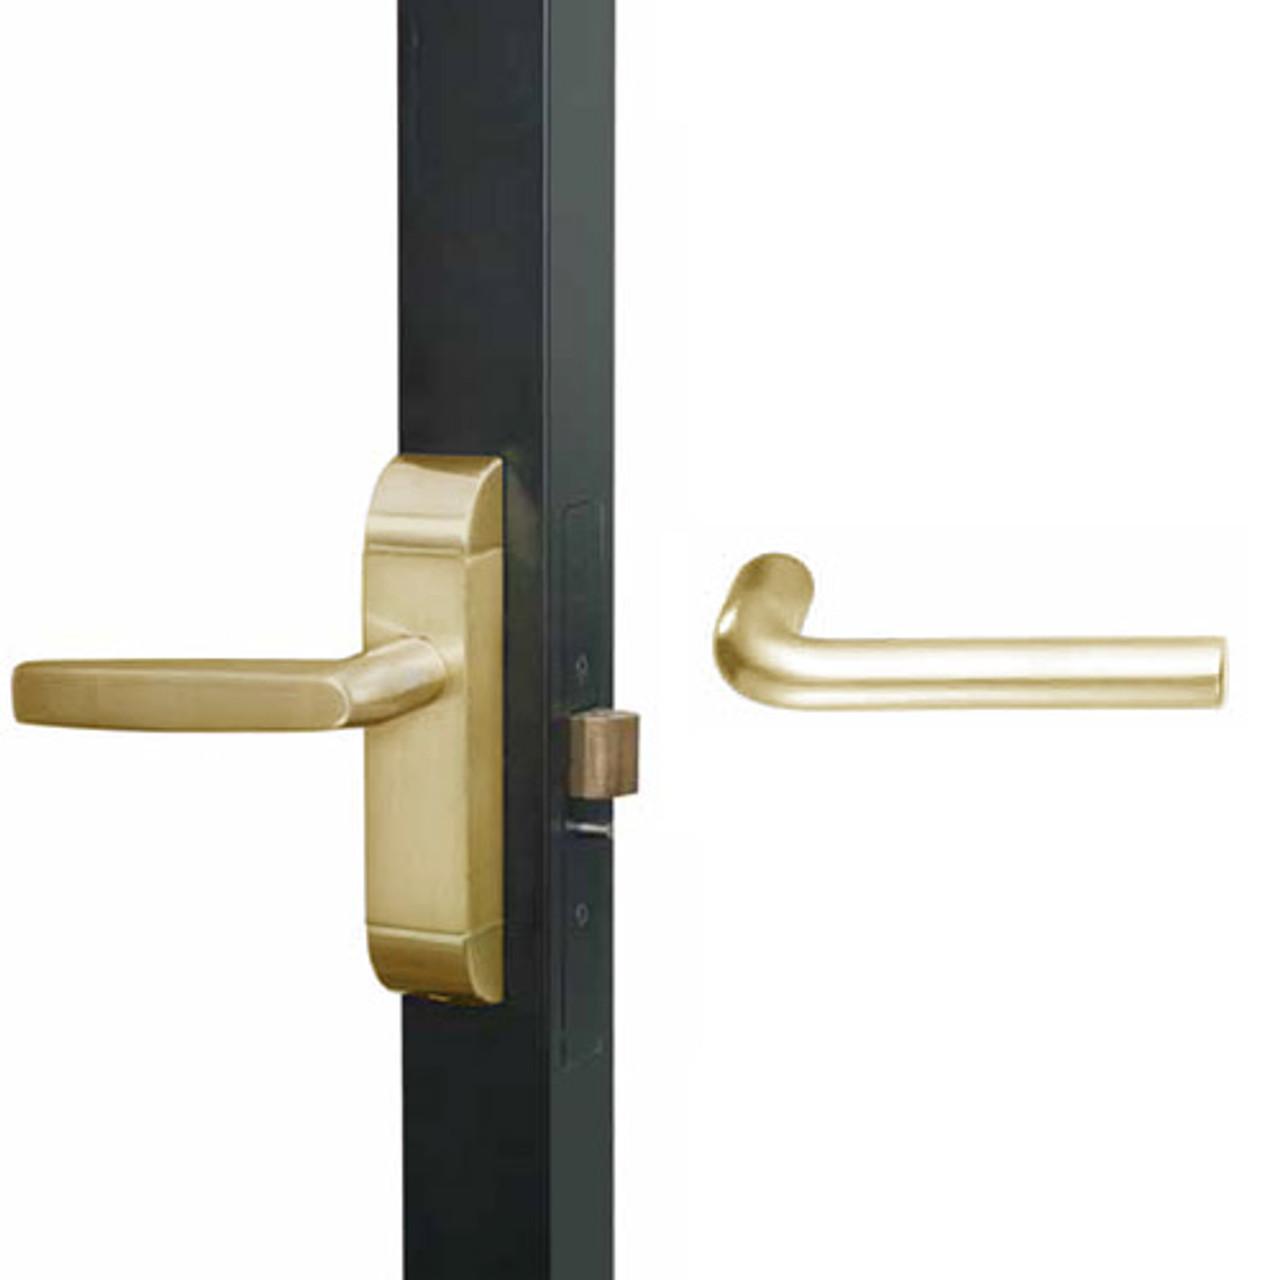 4600M-ME-622-US4 Adams Rite ME Designer Deadlatch handle in Satin Brass Finish